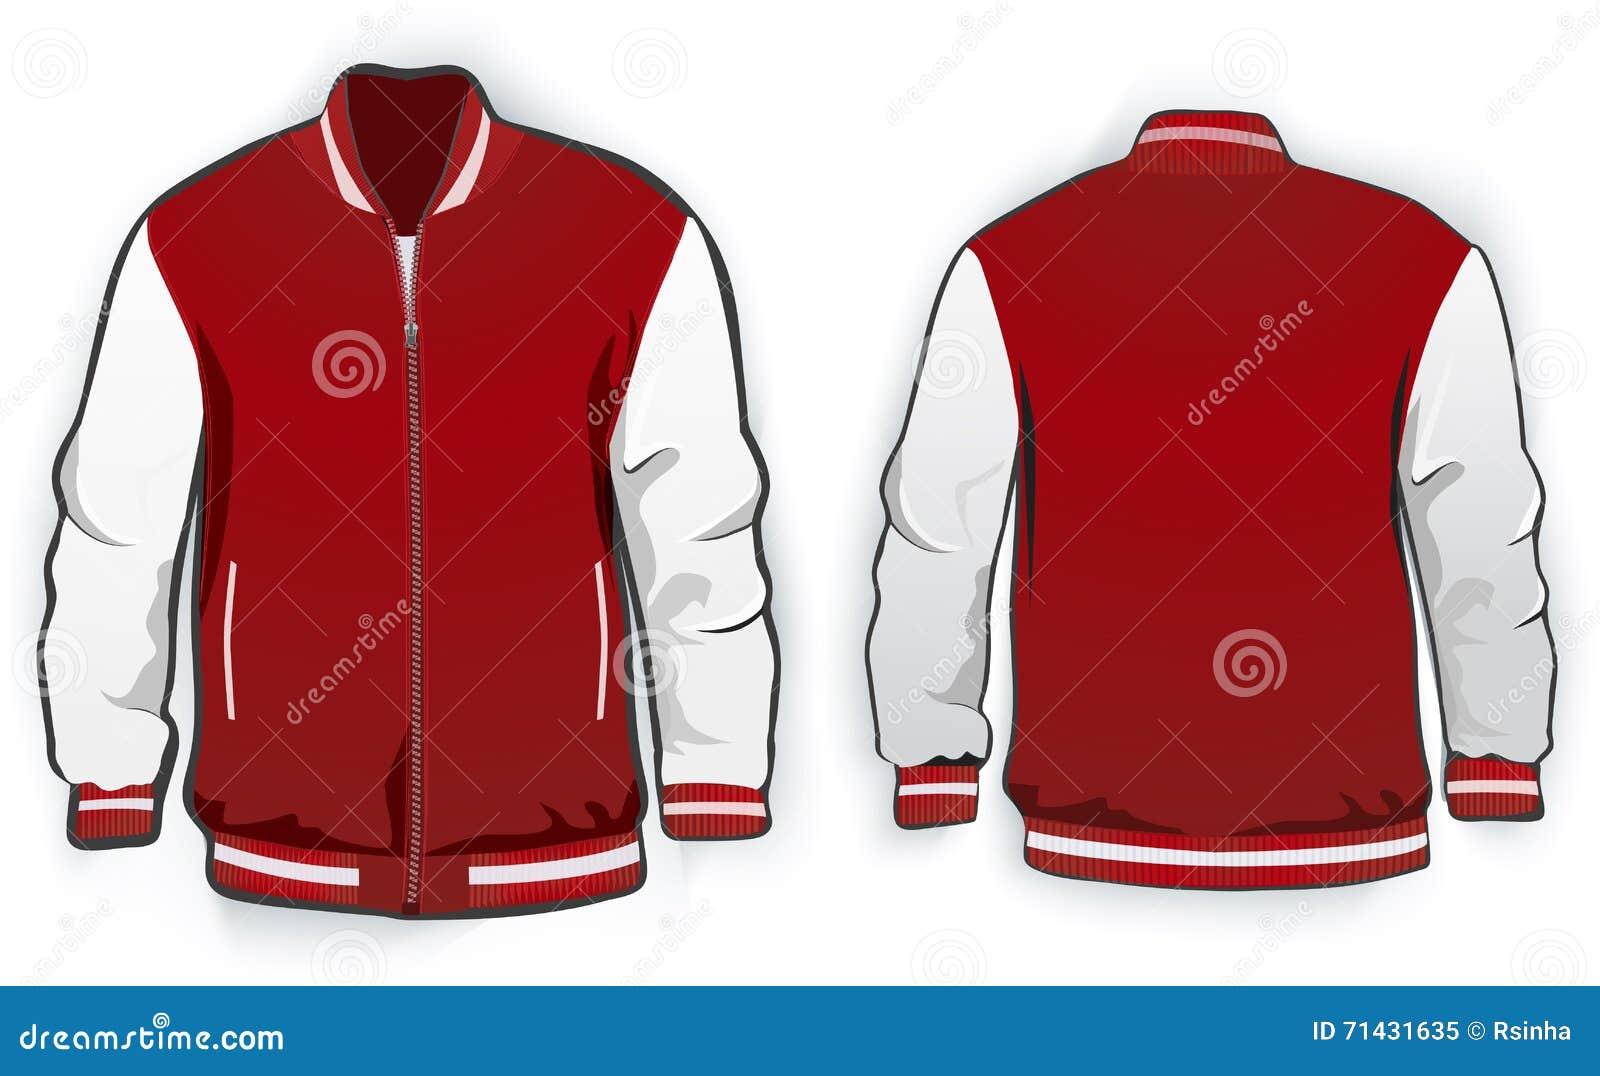 varsity jacket template stock illustrations 89 varsity jacket